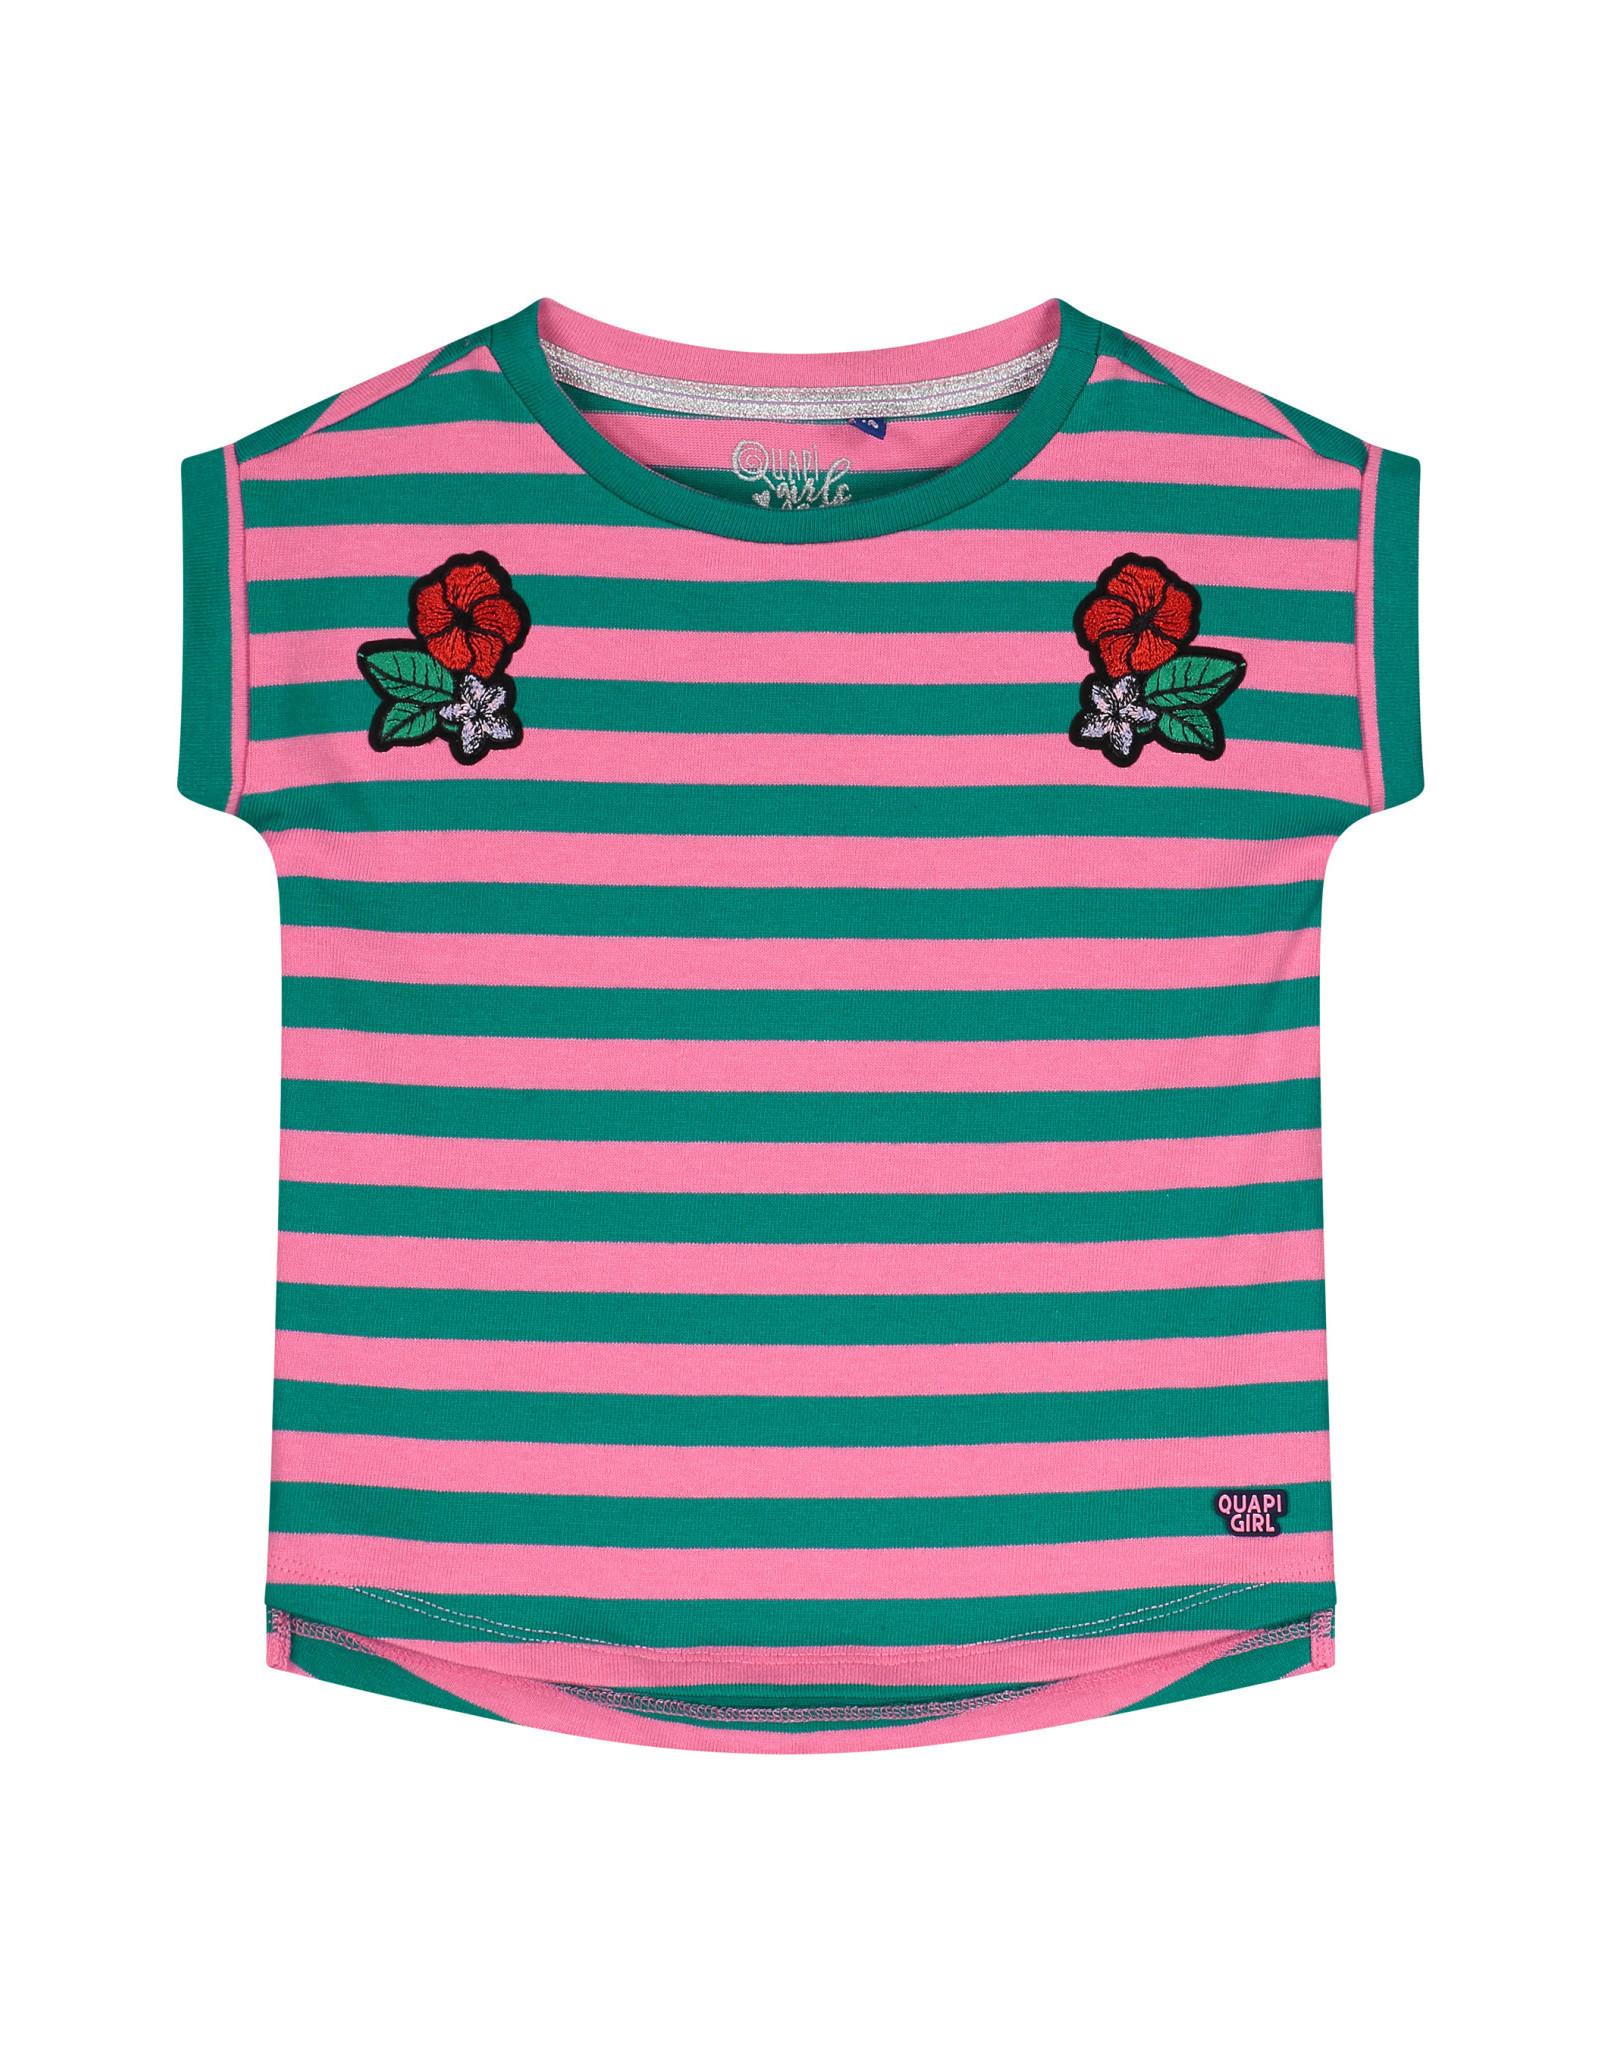 Quapi ALIAH S202 Balad Pink Stripe